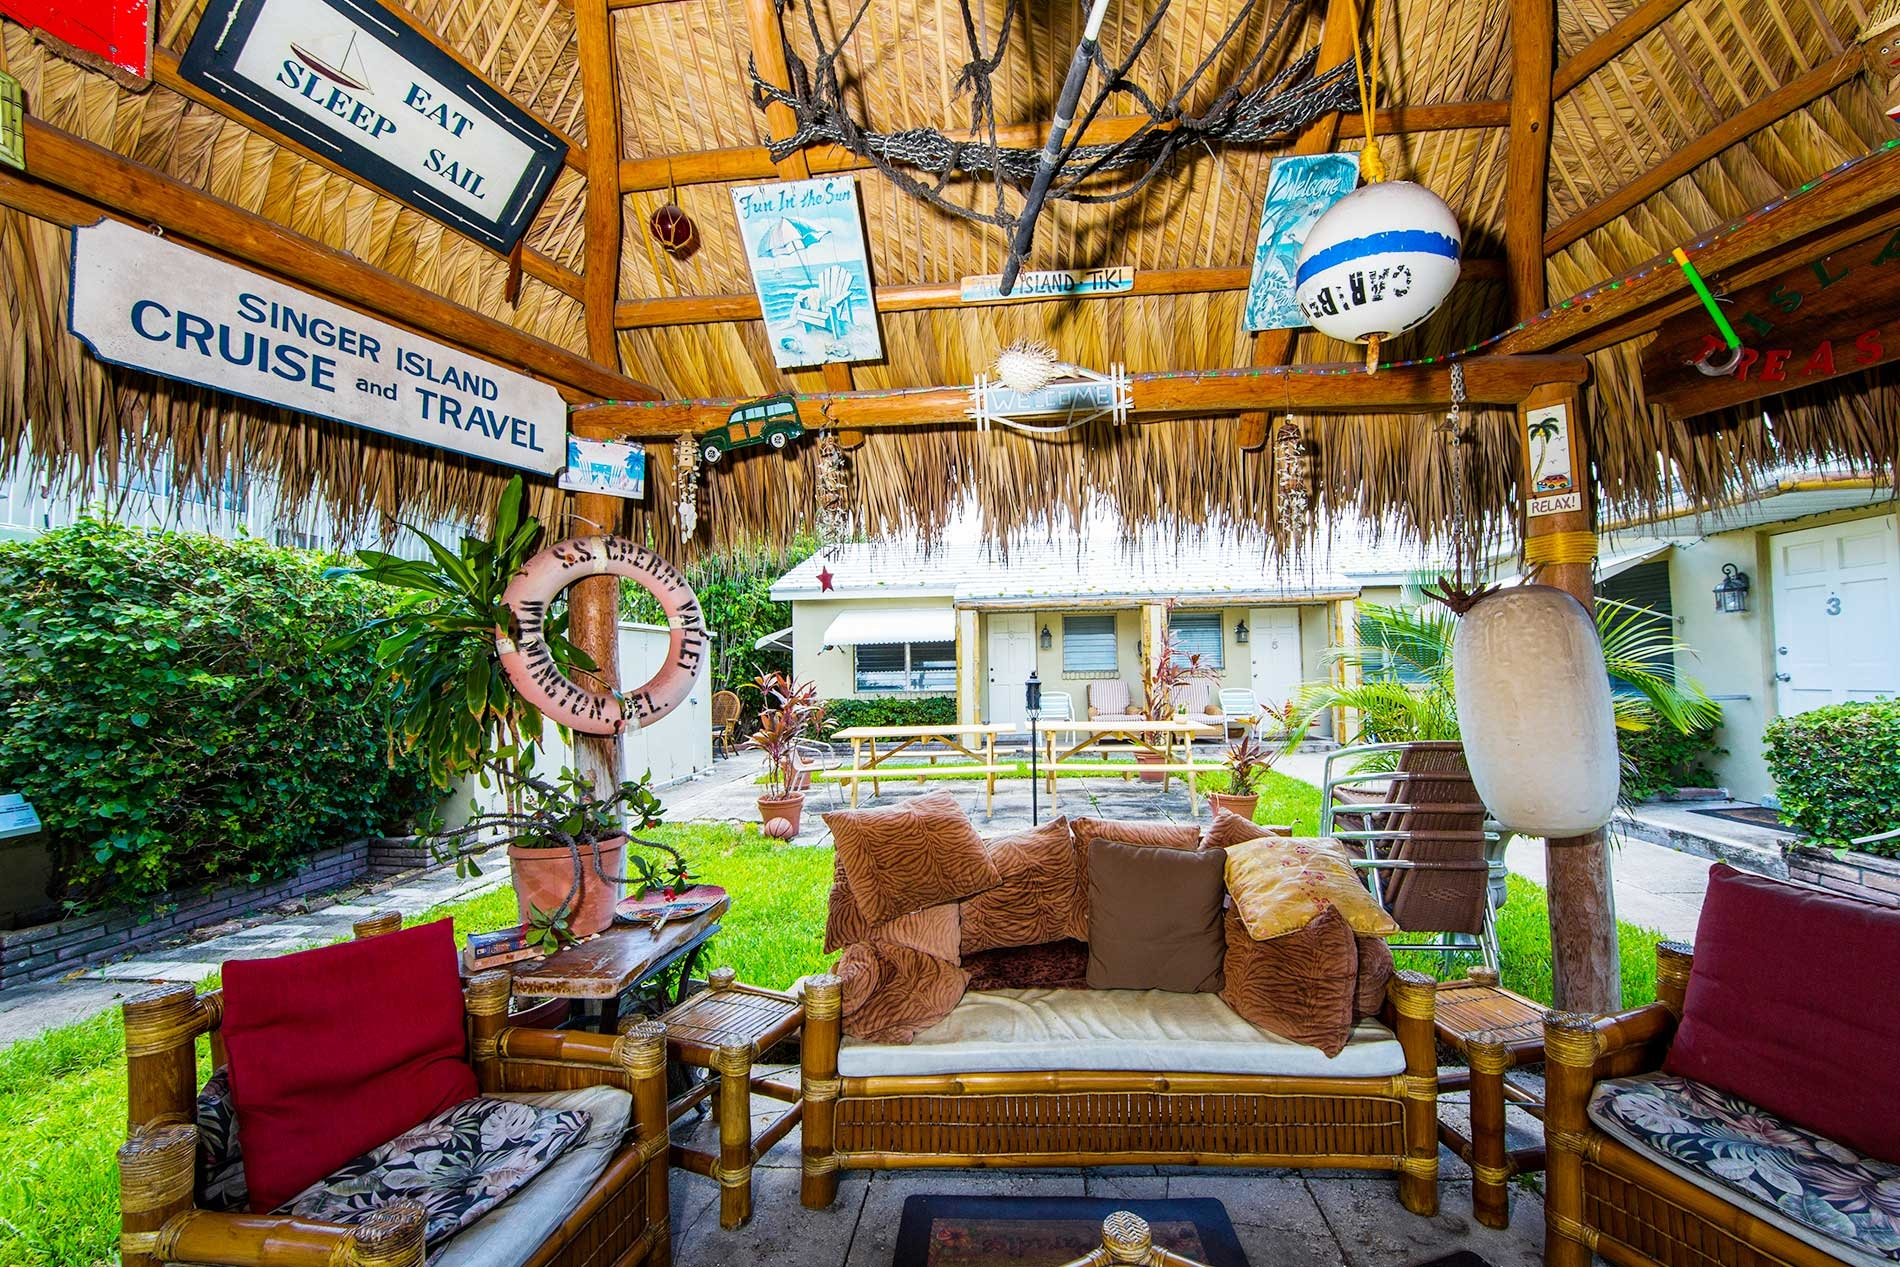 Singer Island Recovery Center West Palm Beach Fl